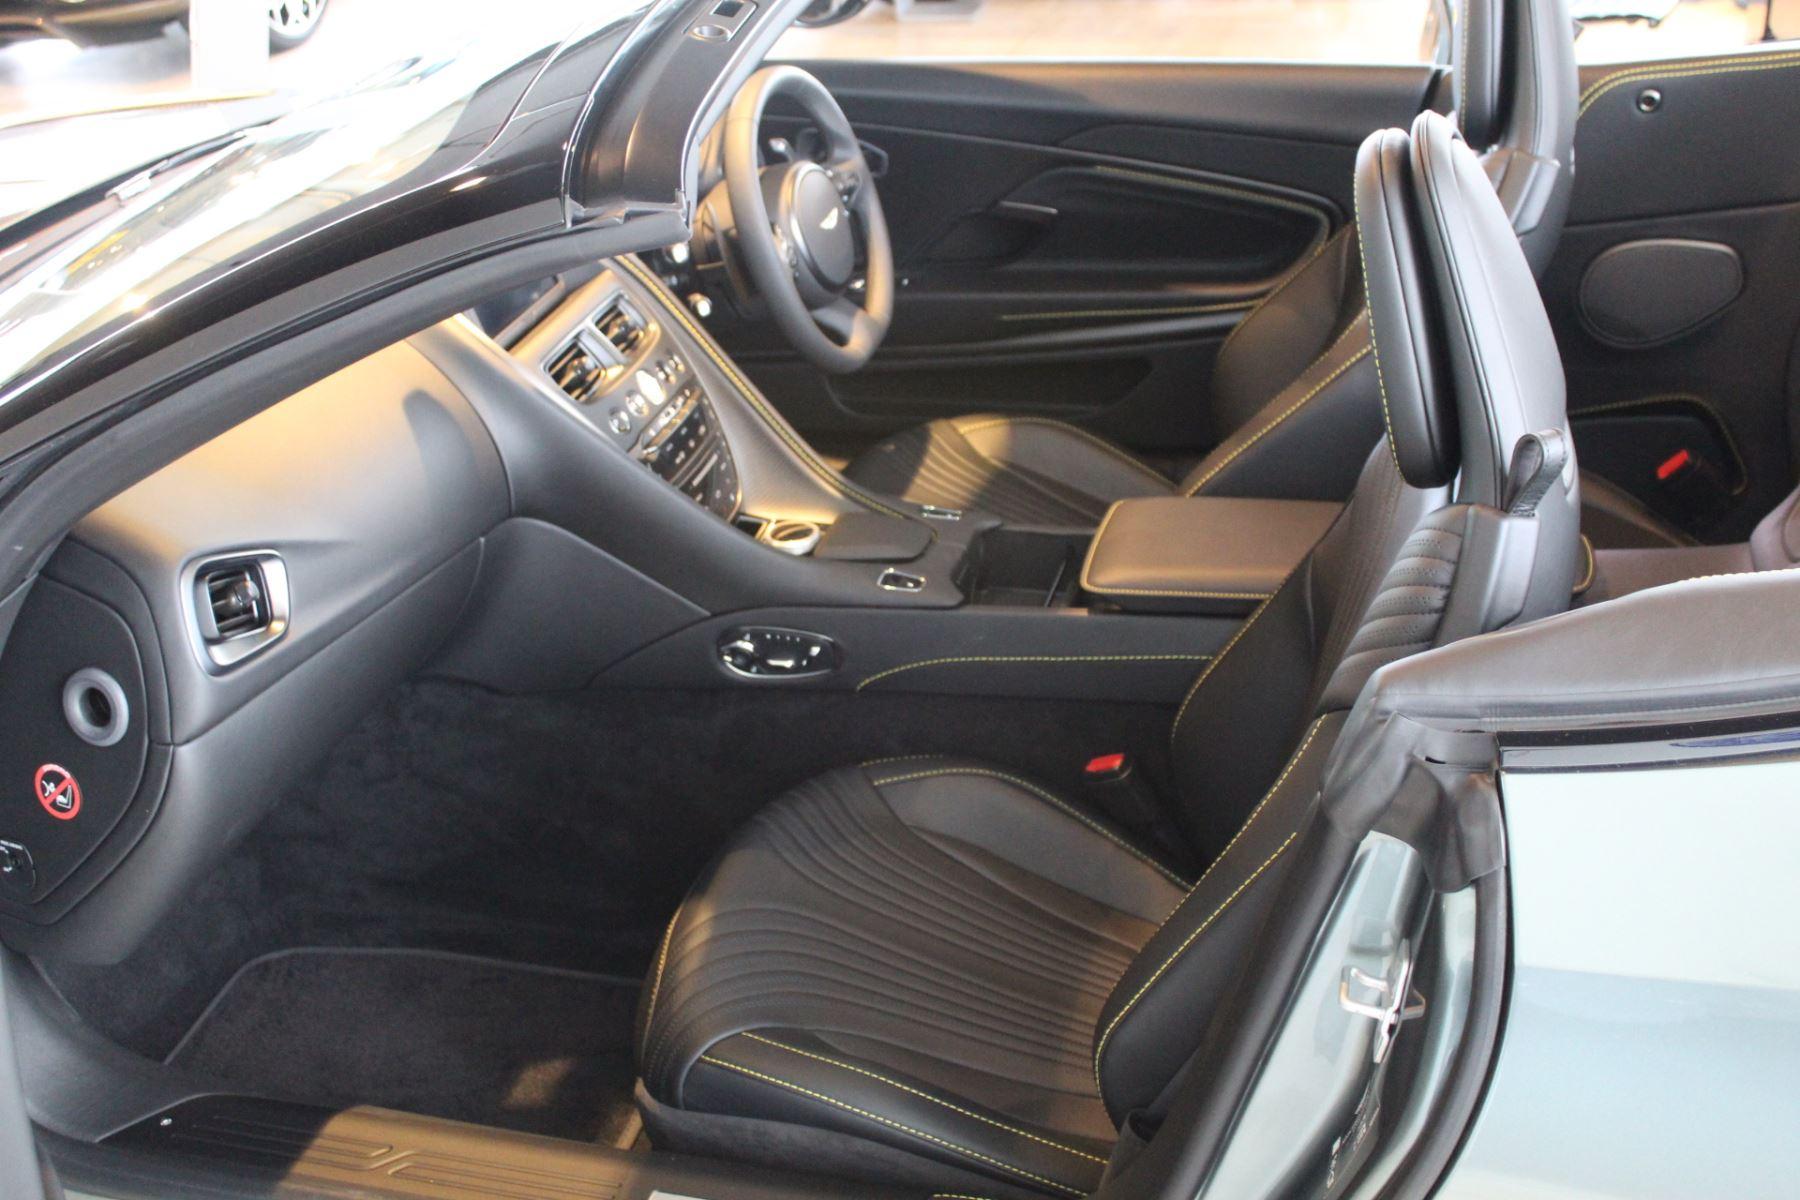 Aston Martin DB11 V8 Volante Touchtronic image 2